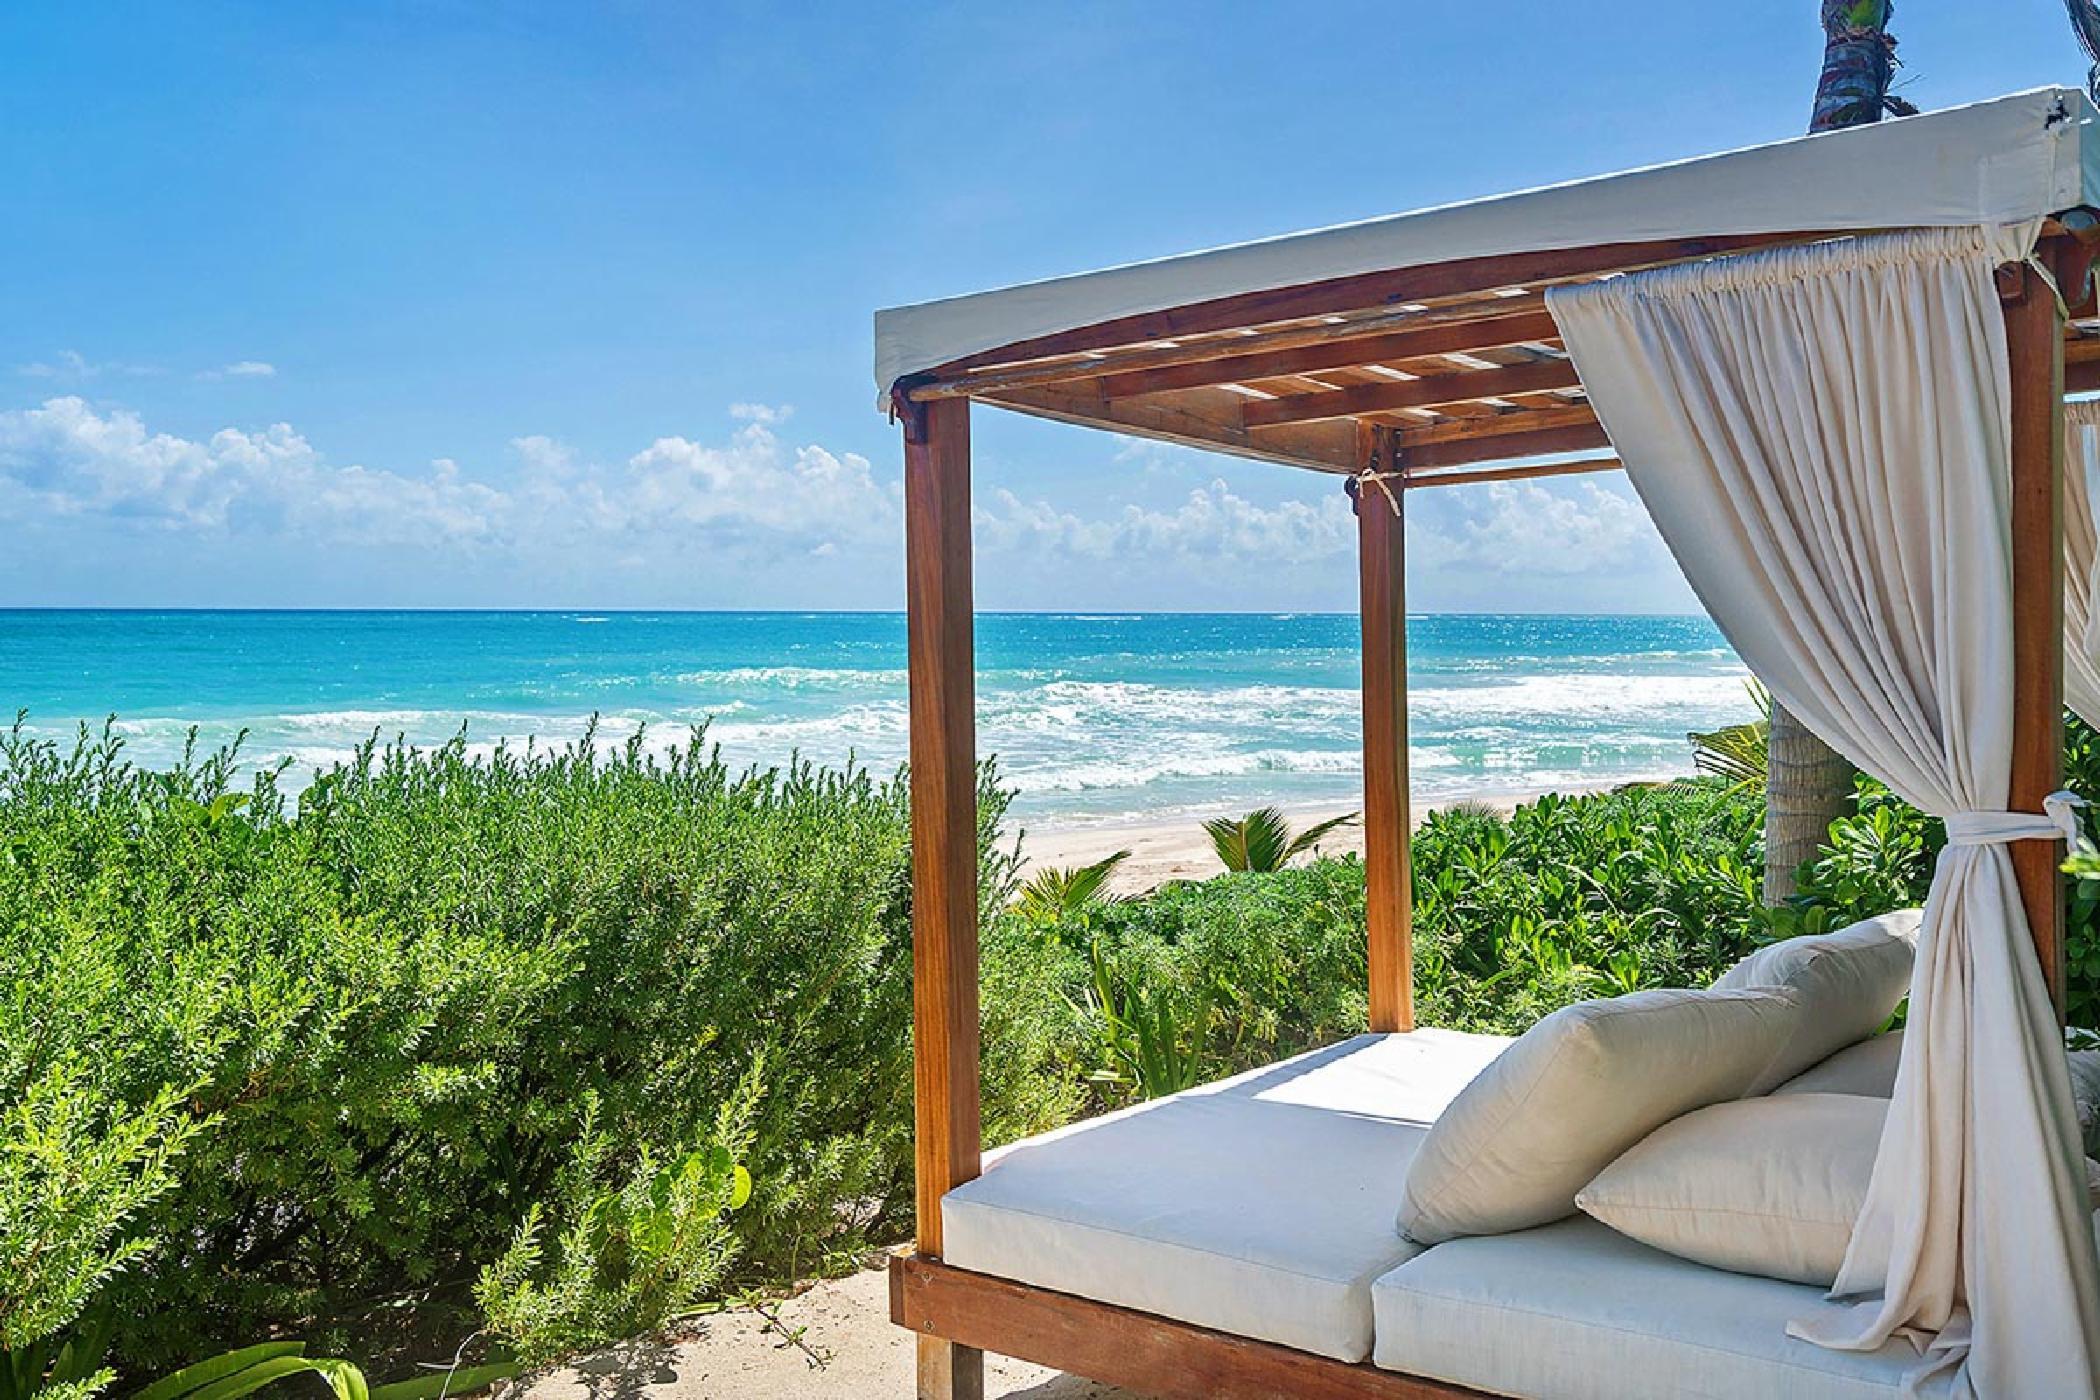 Maya_Luxe_Riviera_Maya_Luxury_Villas_Experiences_Sian_Kaan_Tulum_4_Bedrooms_Casa_Cantarena_7.jpg